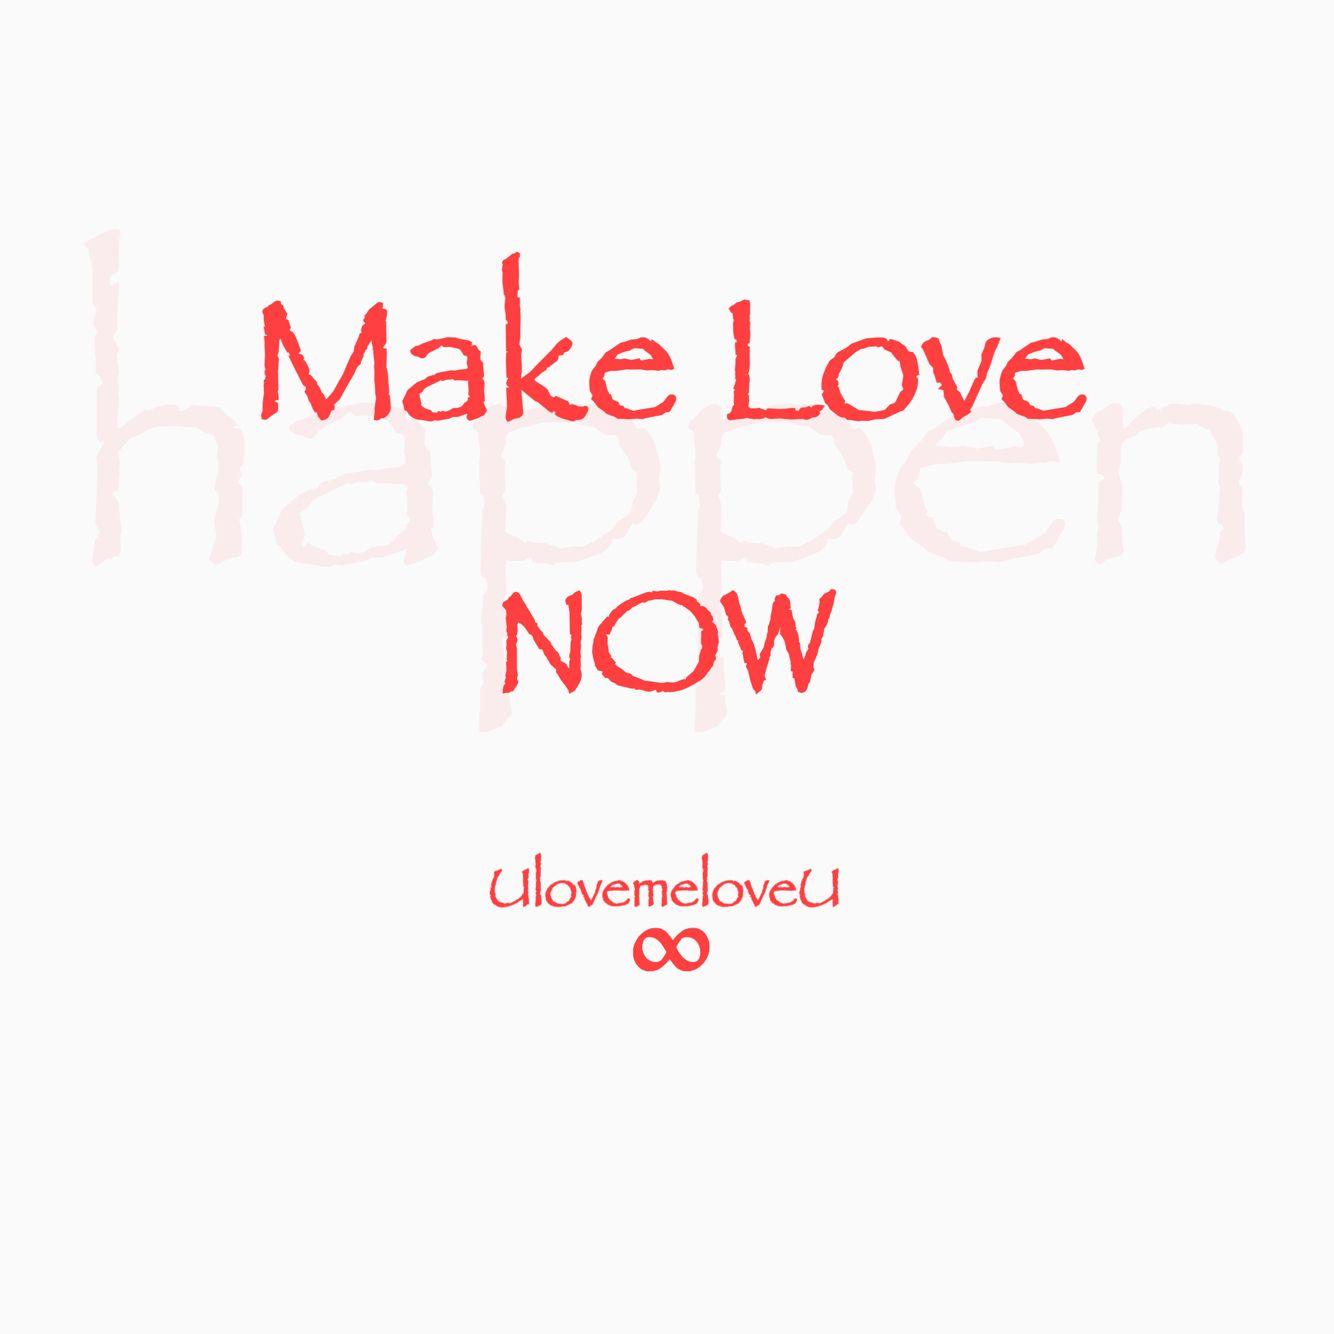 Make love happen NOW  UlovemeloveU